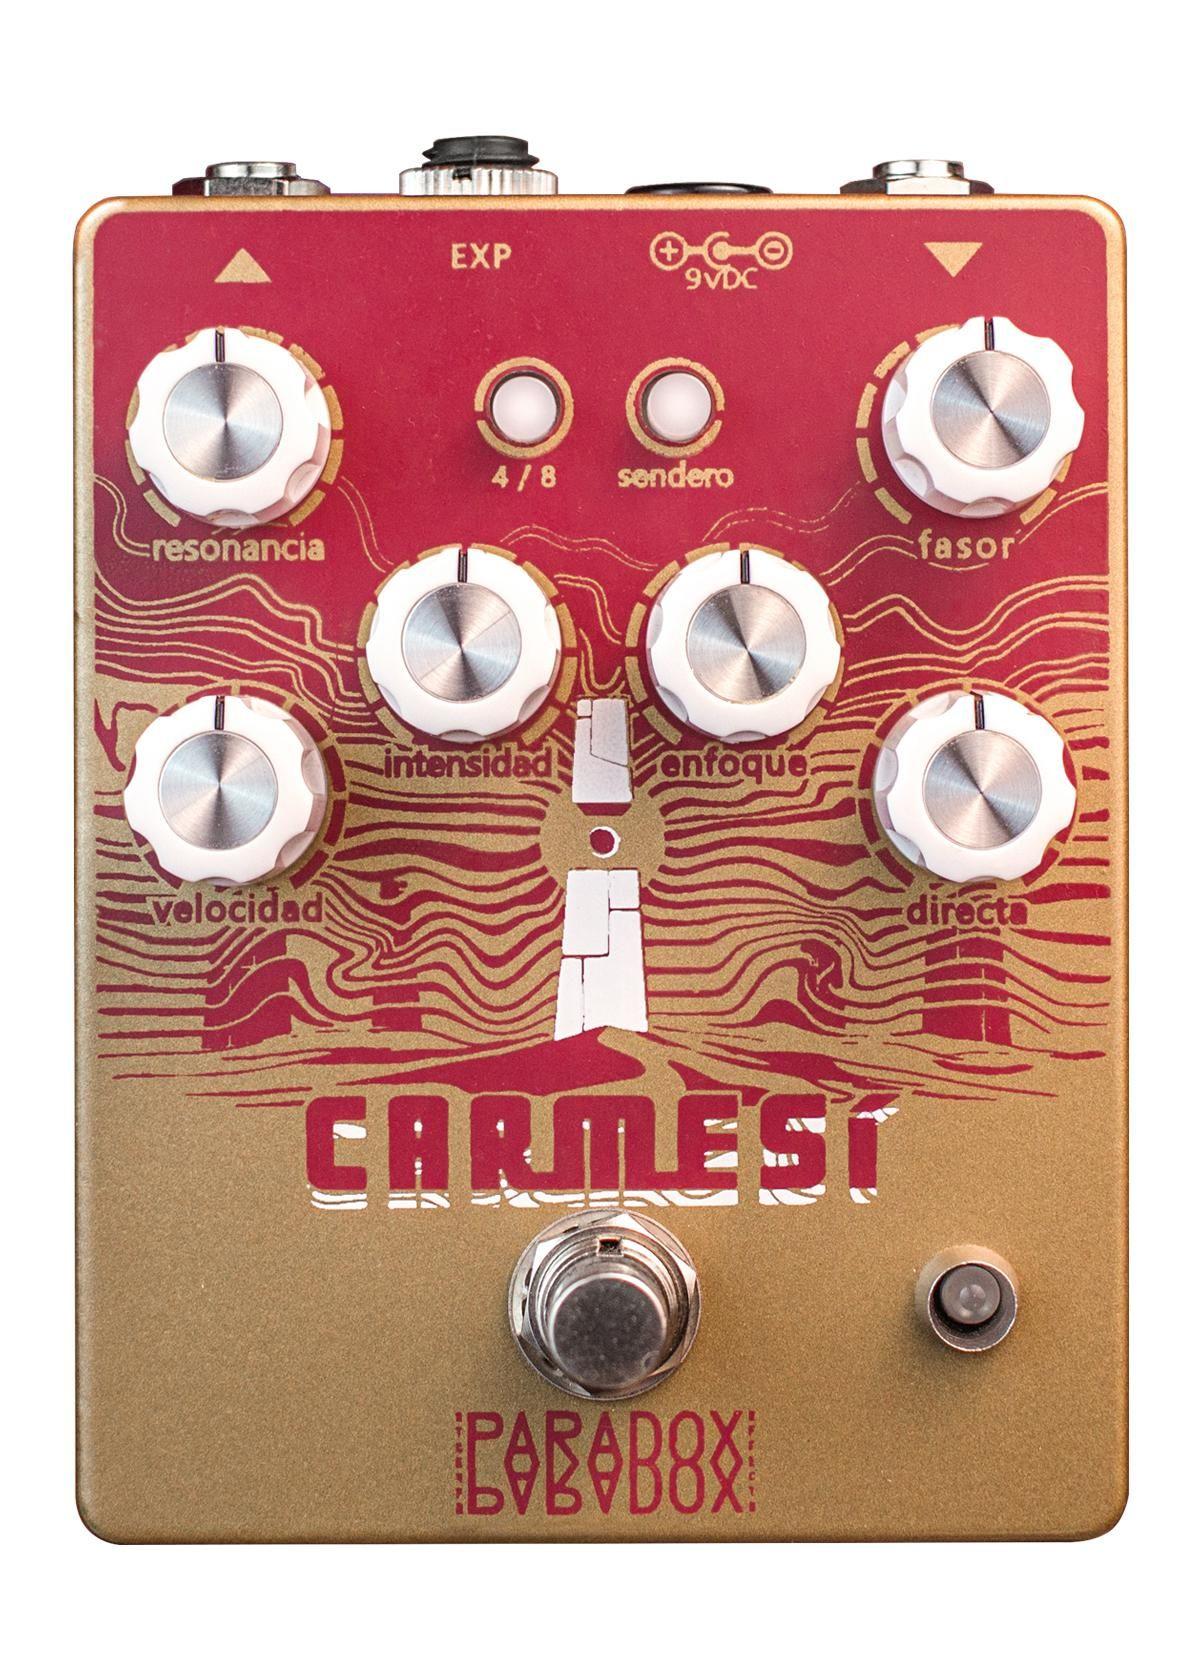 Paradox Effects Announces the Carmesí Phaser